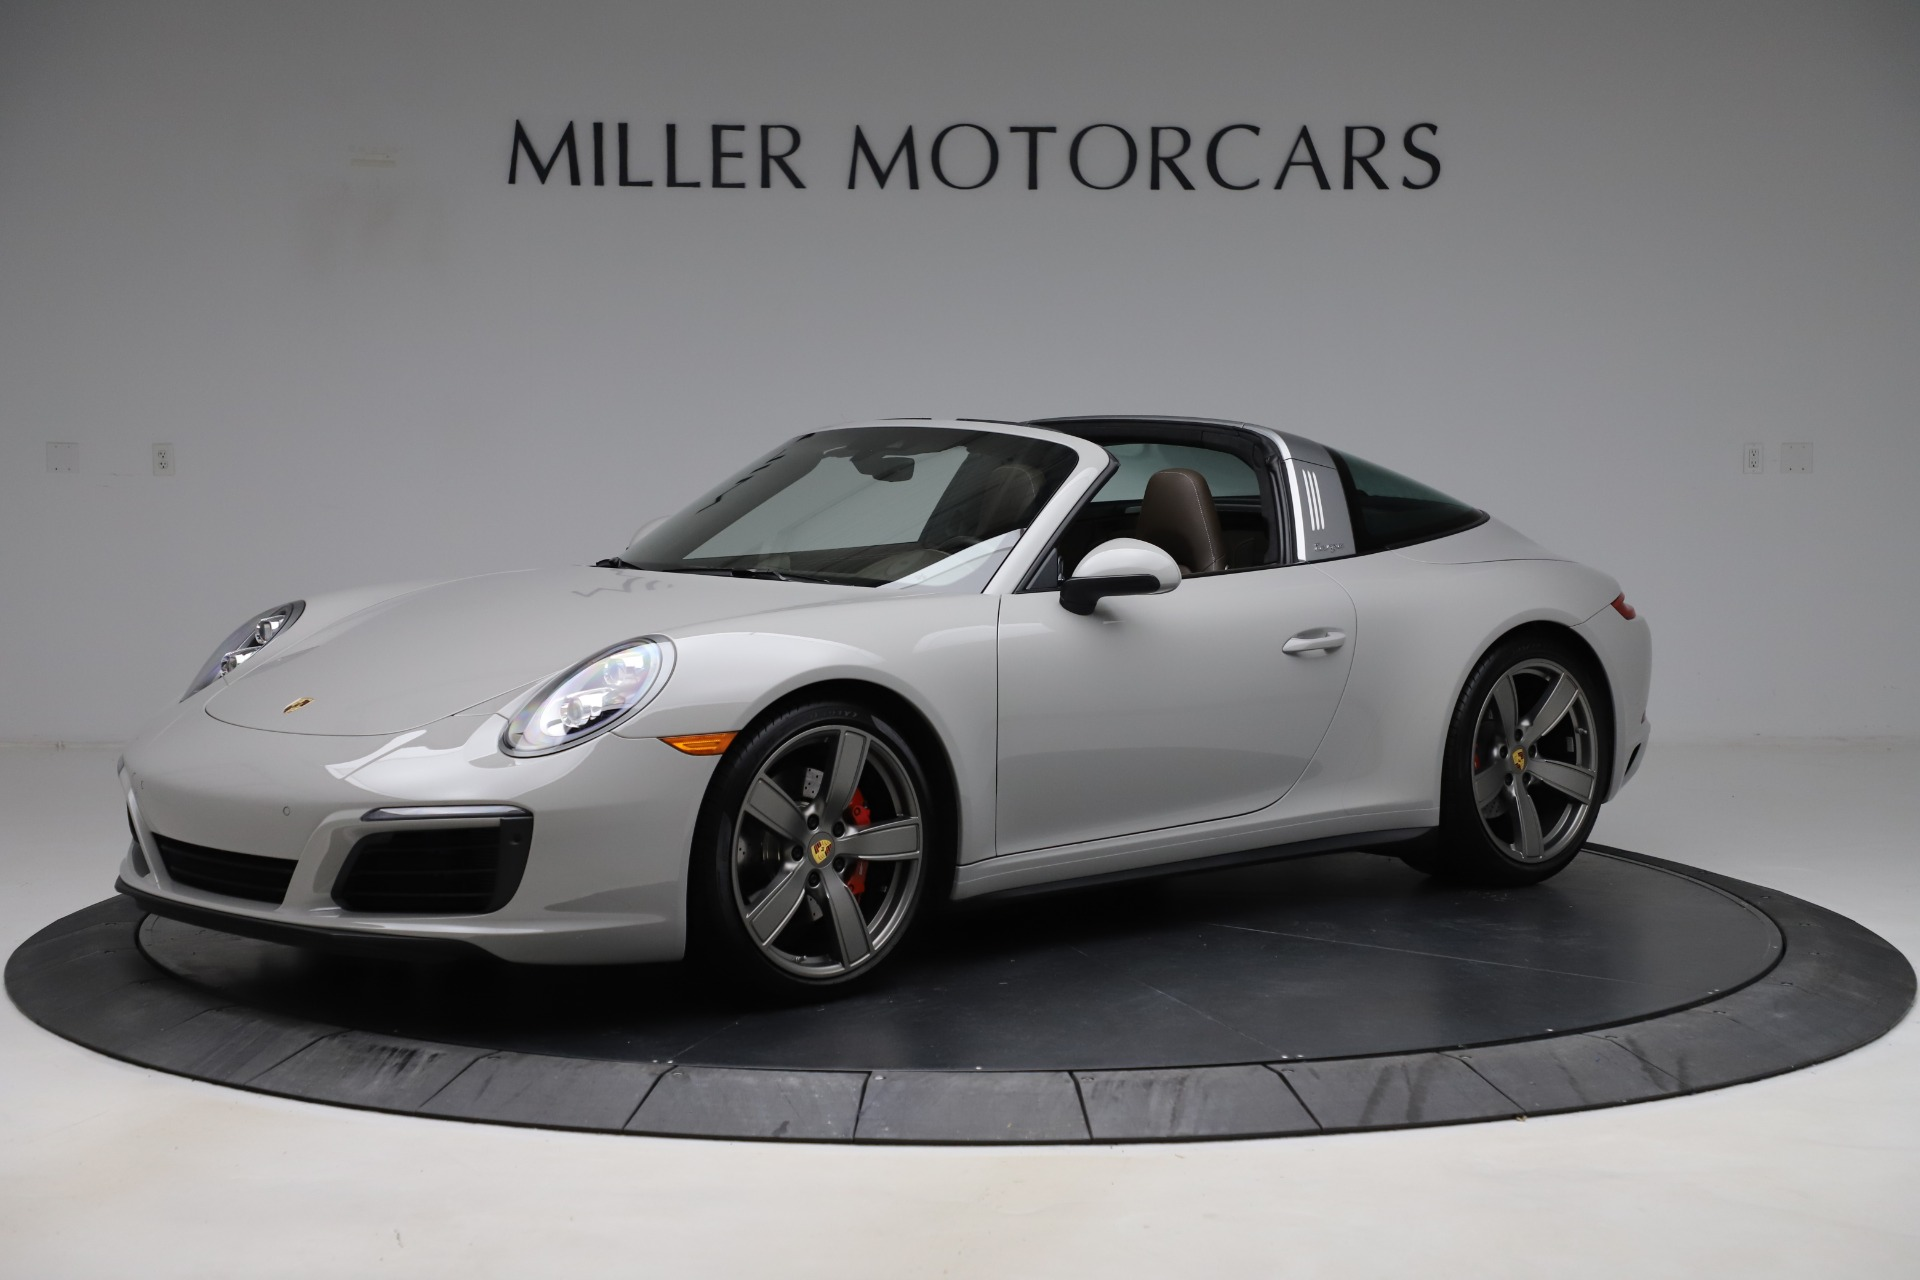 Used 2018 Porsche 911 Targa 4S for sale $134,900 at Maserati of Westport in Westport CT 06880 1